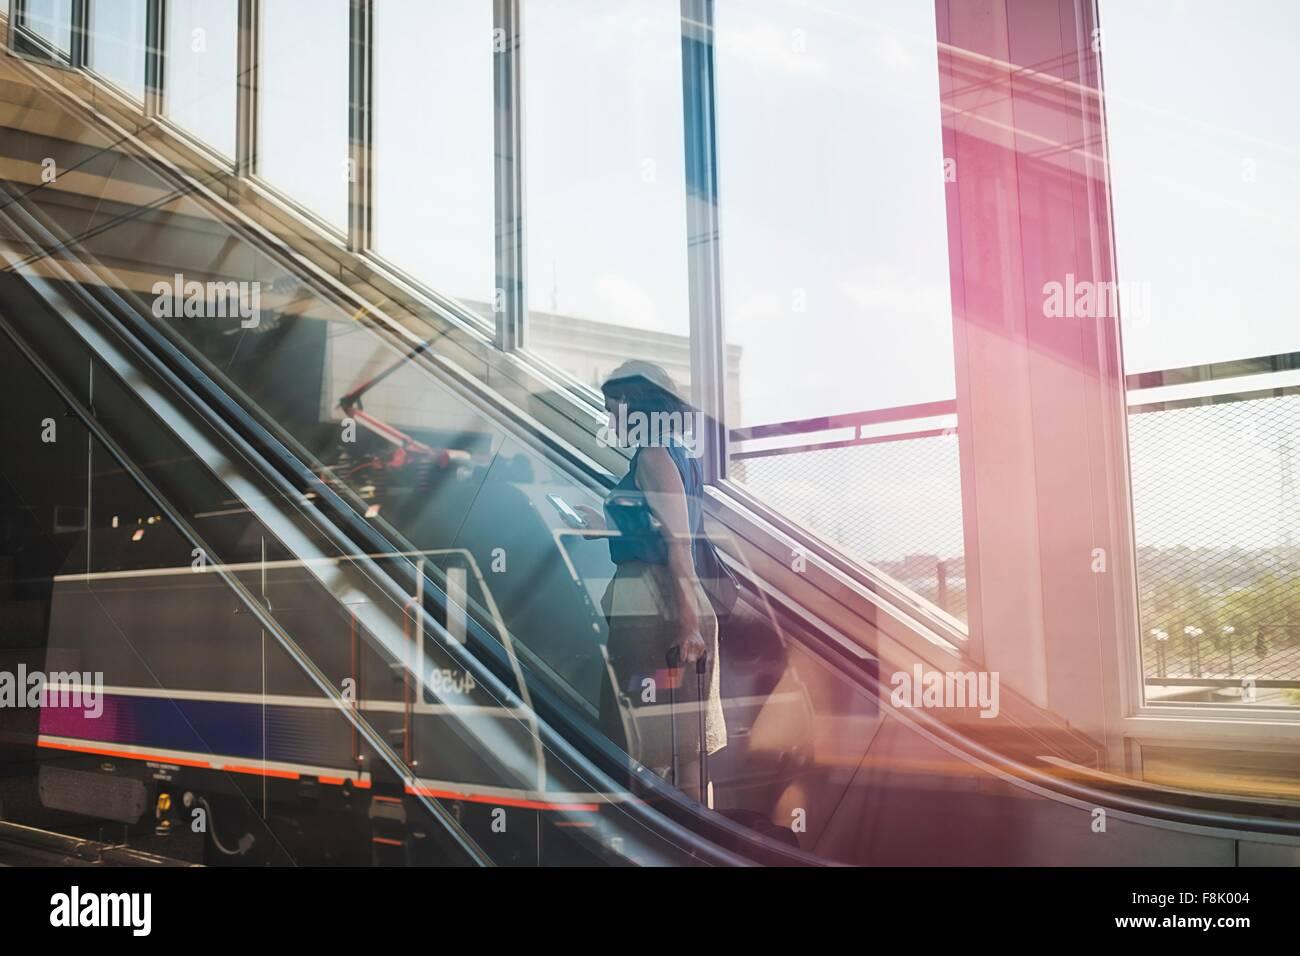 Mid adult woman using escalator, holding wheeled suitcase and smartphone - Stock Image